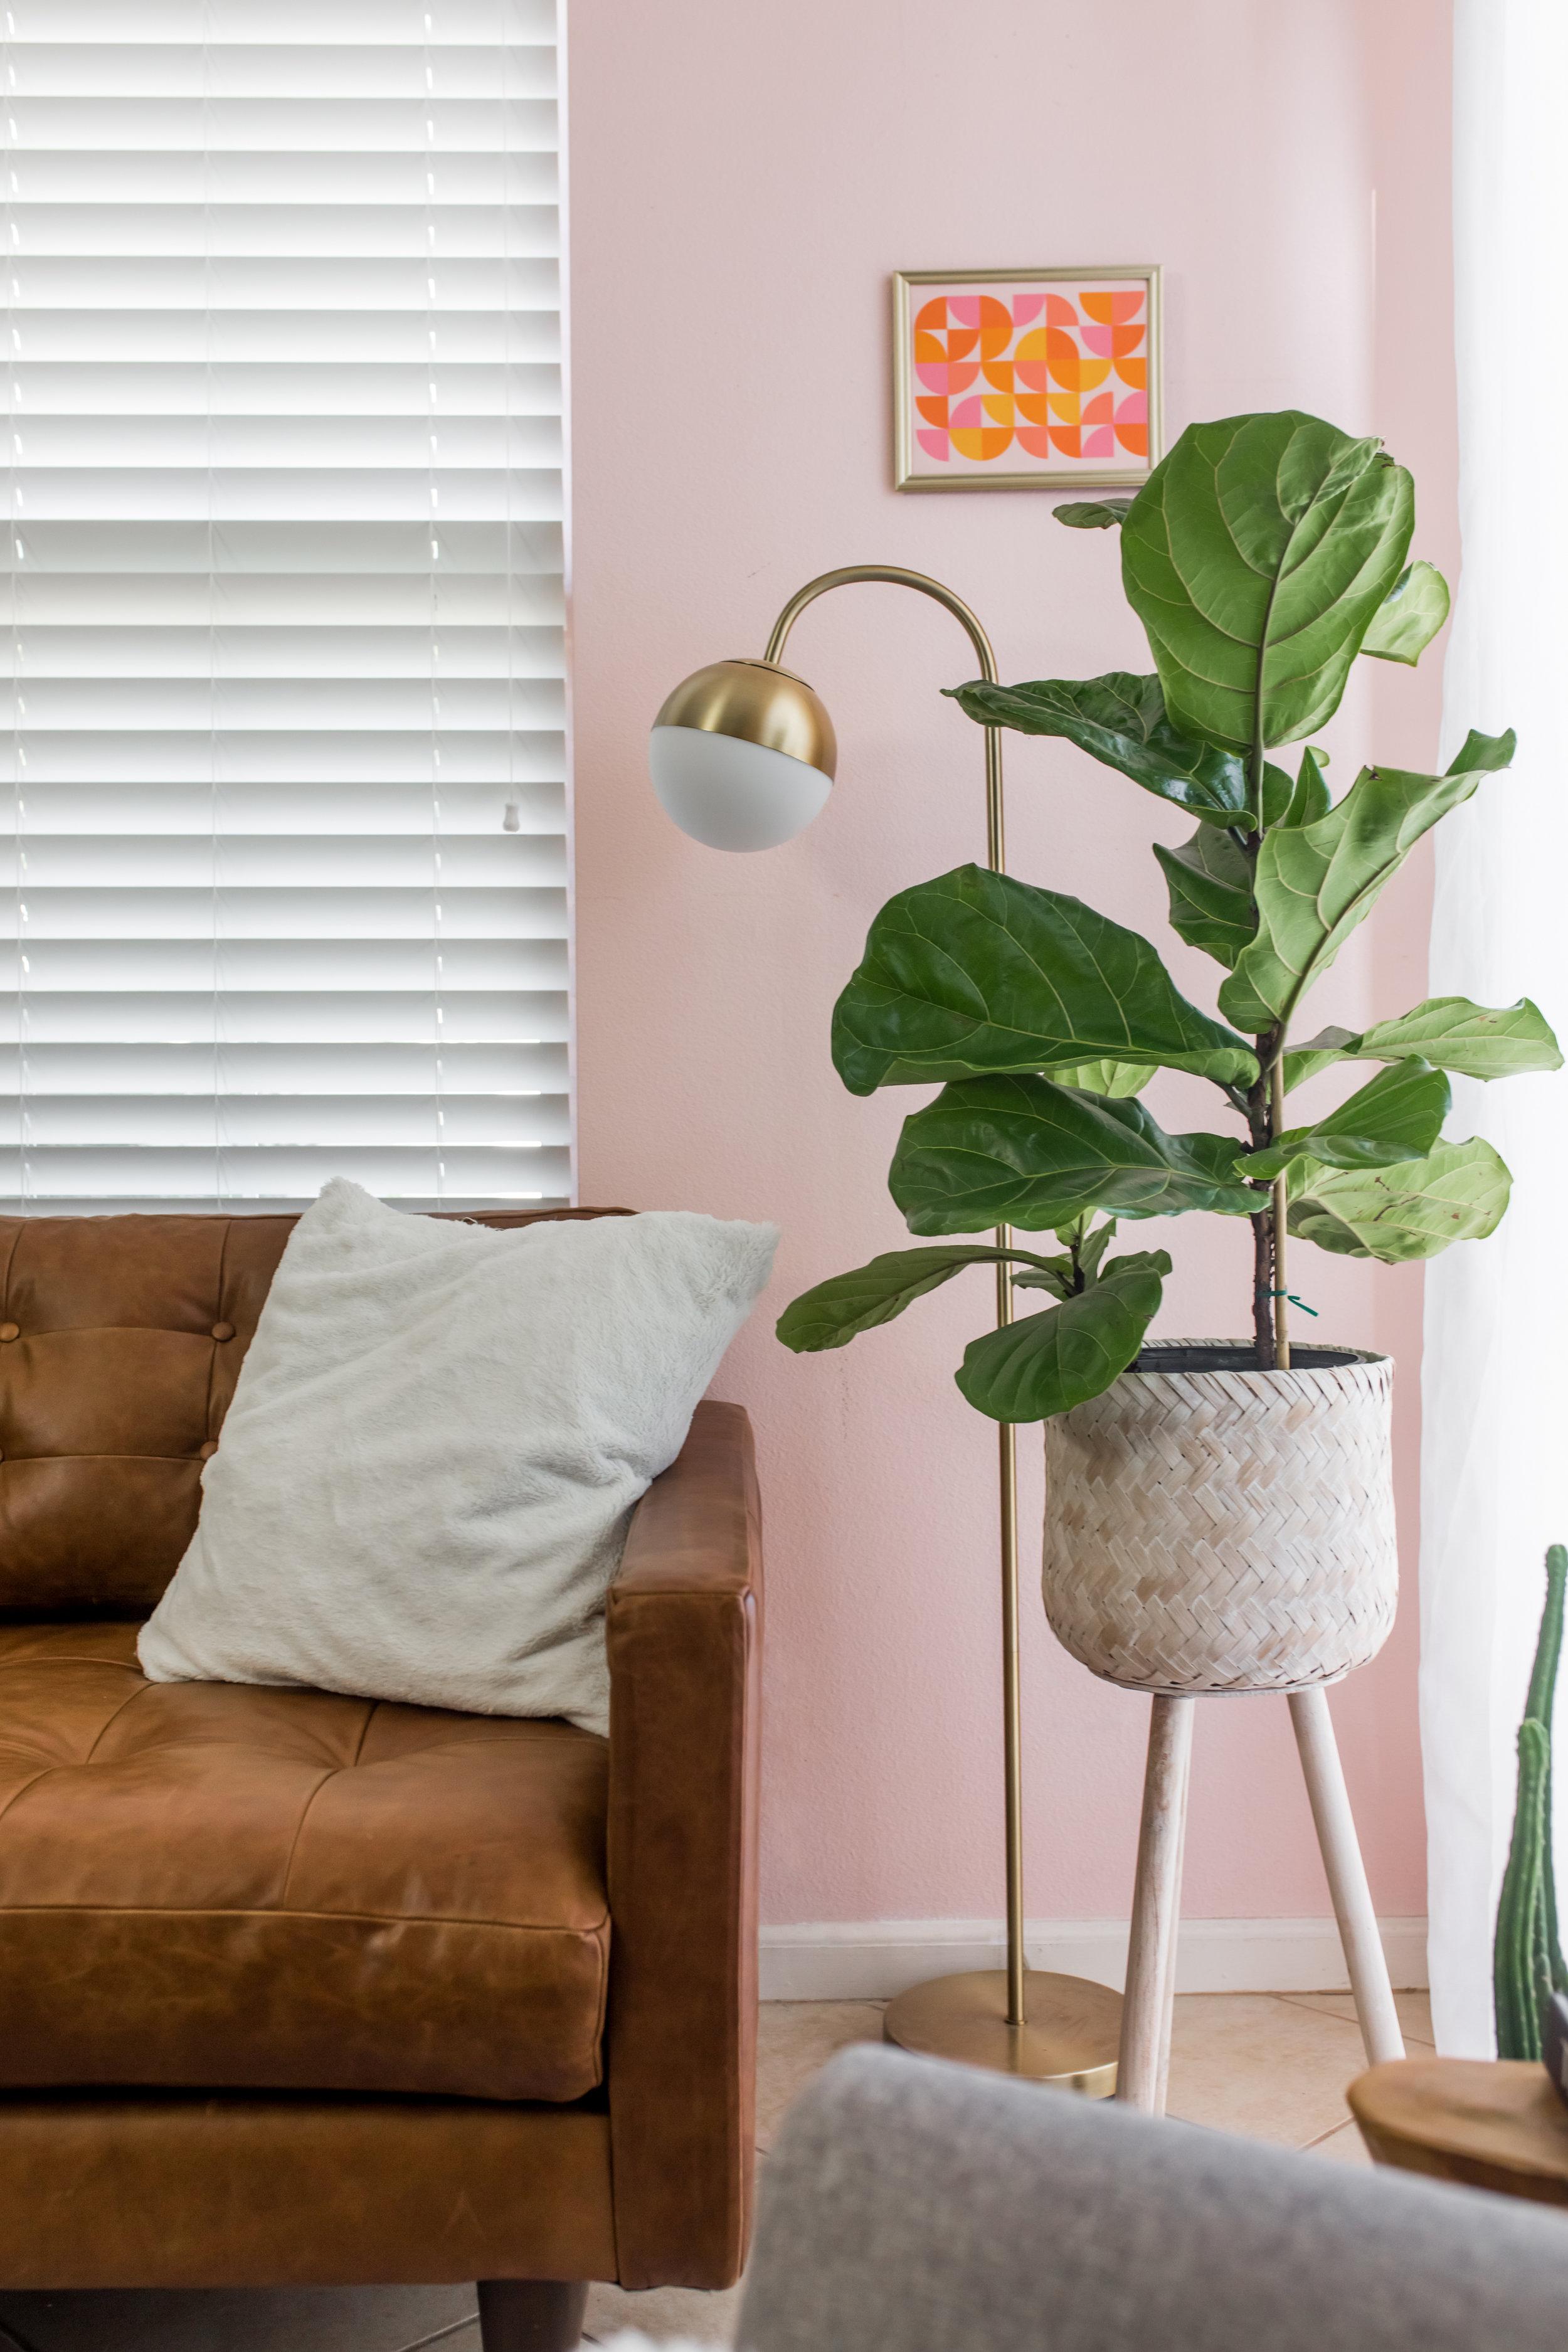 julie-tecson-joybird-living-room-6.jpg